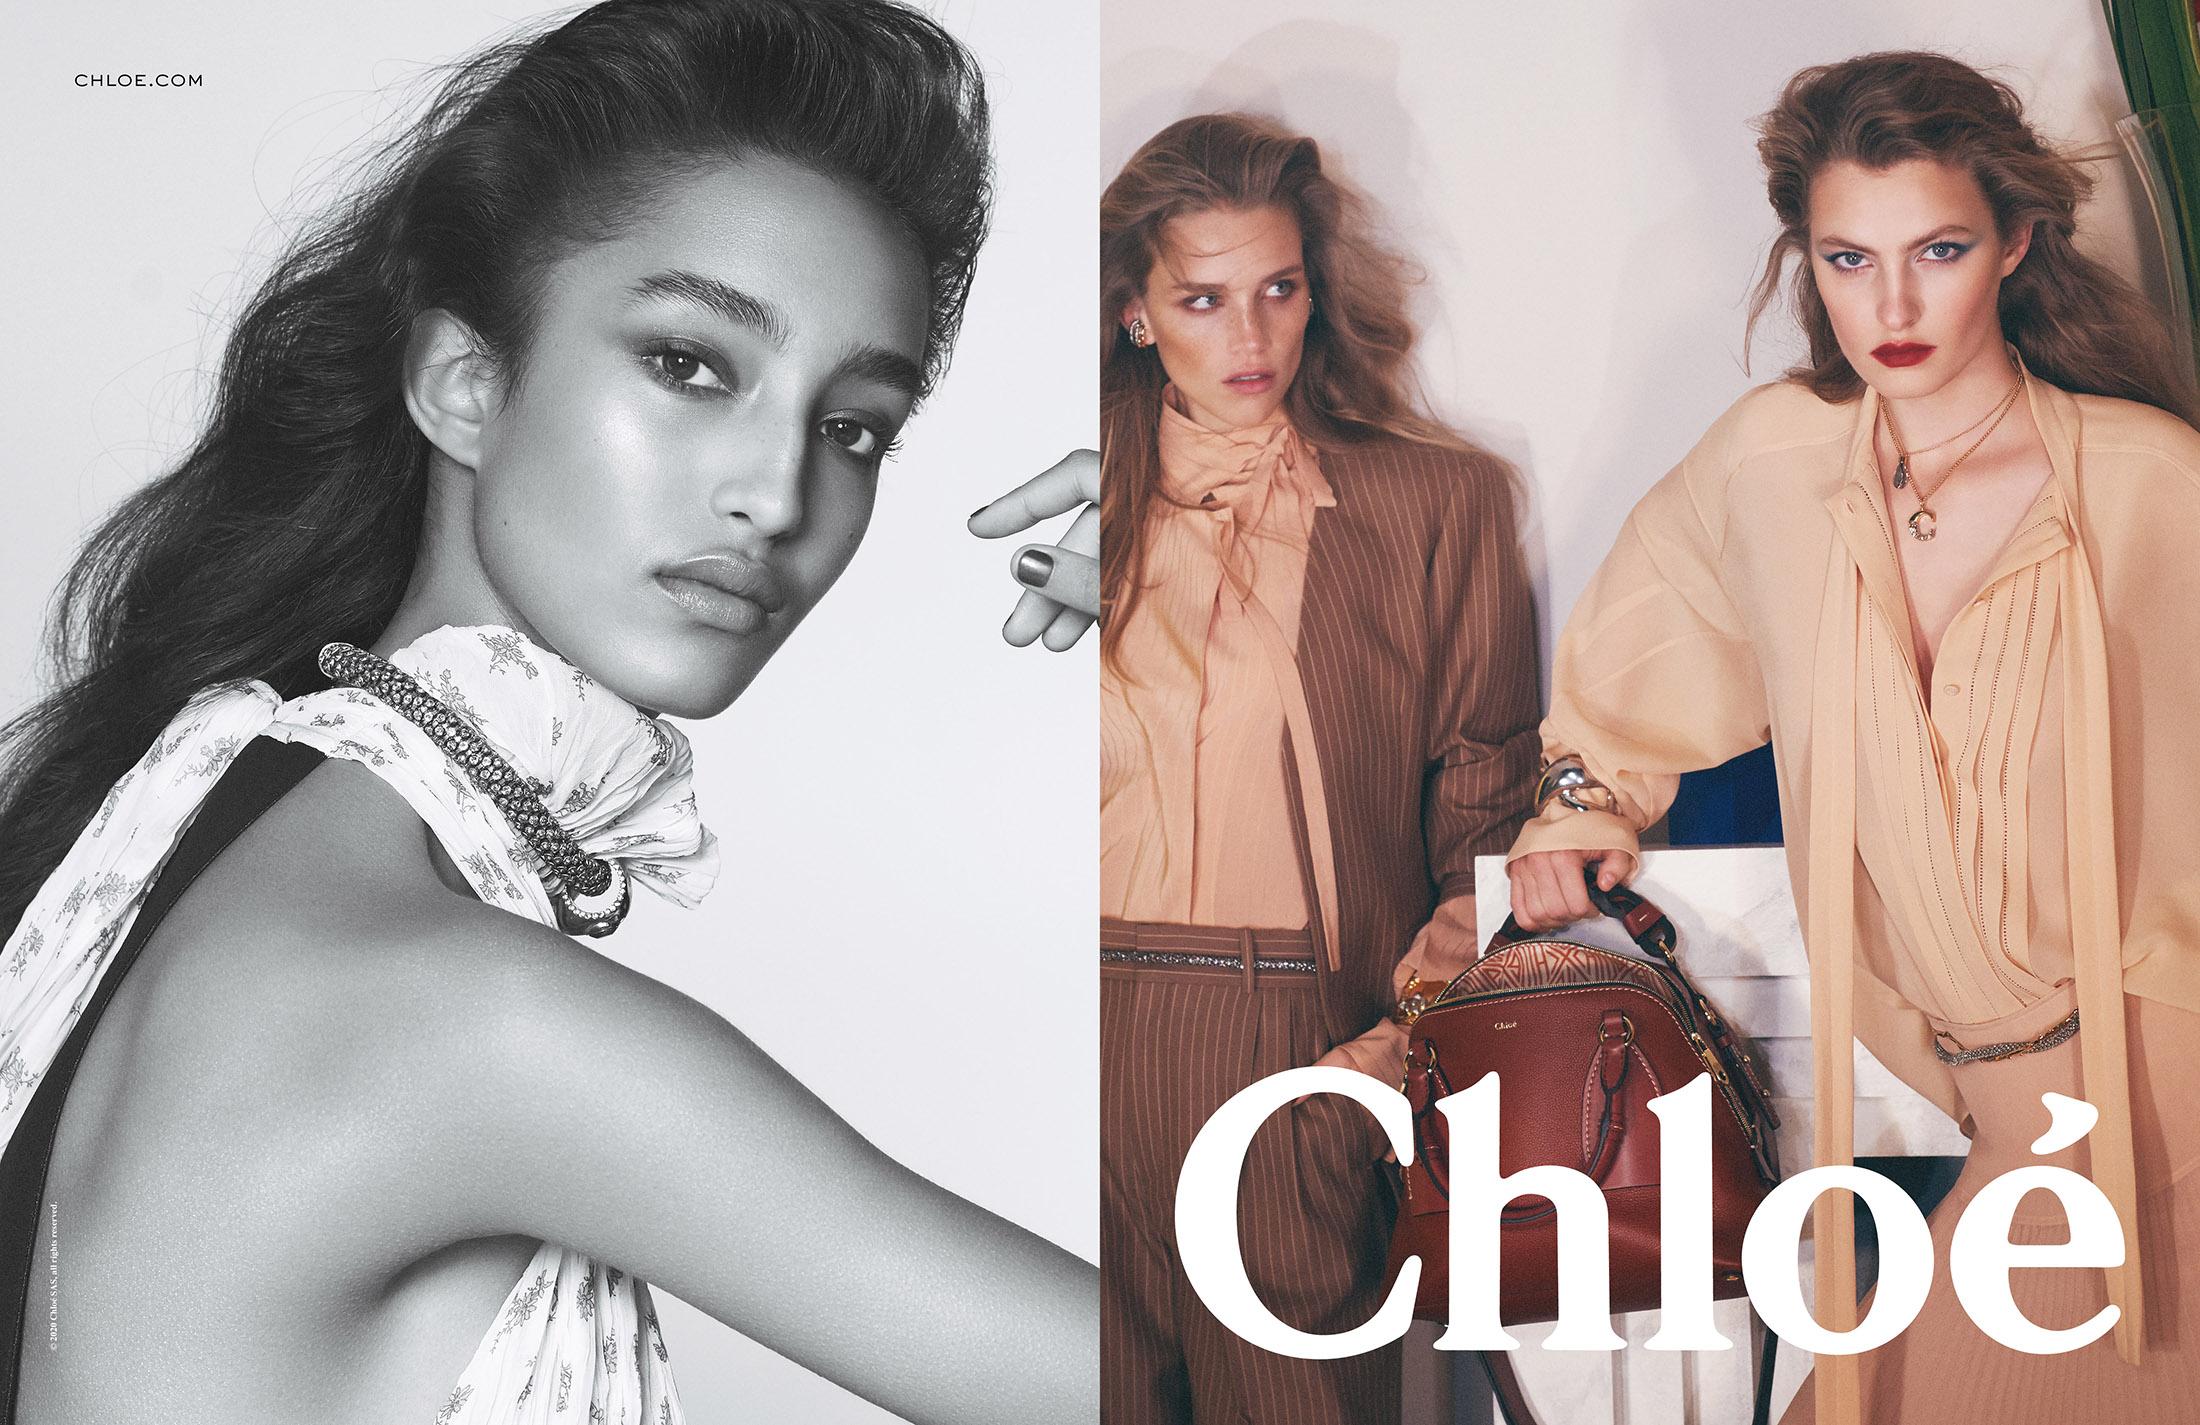 Chloé Spring 2020 Fashion Ad Campaign Photos